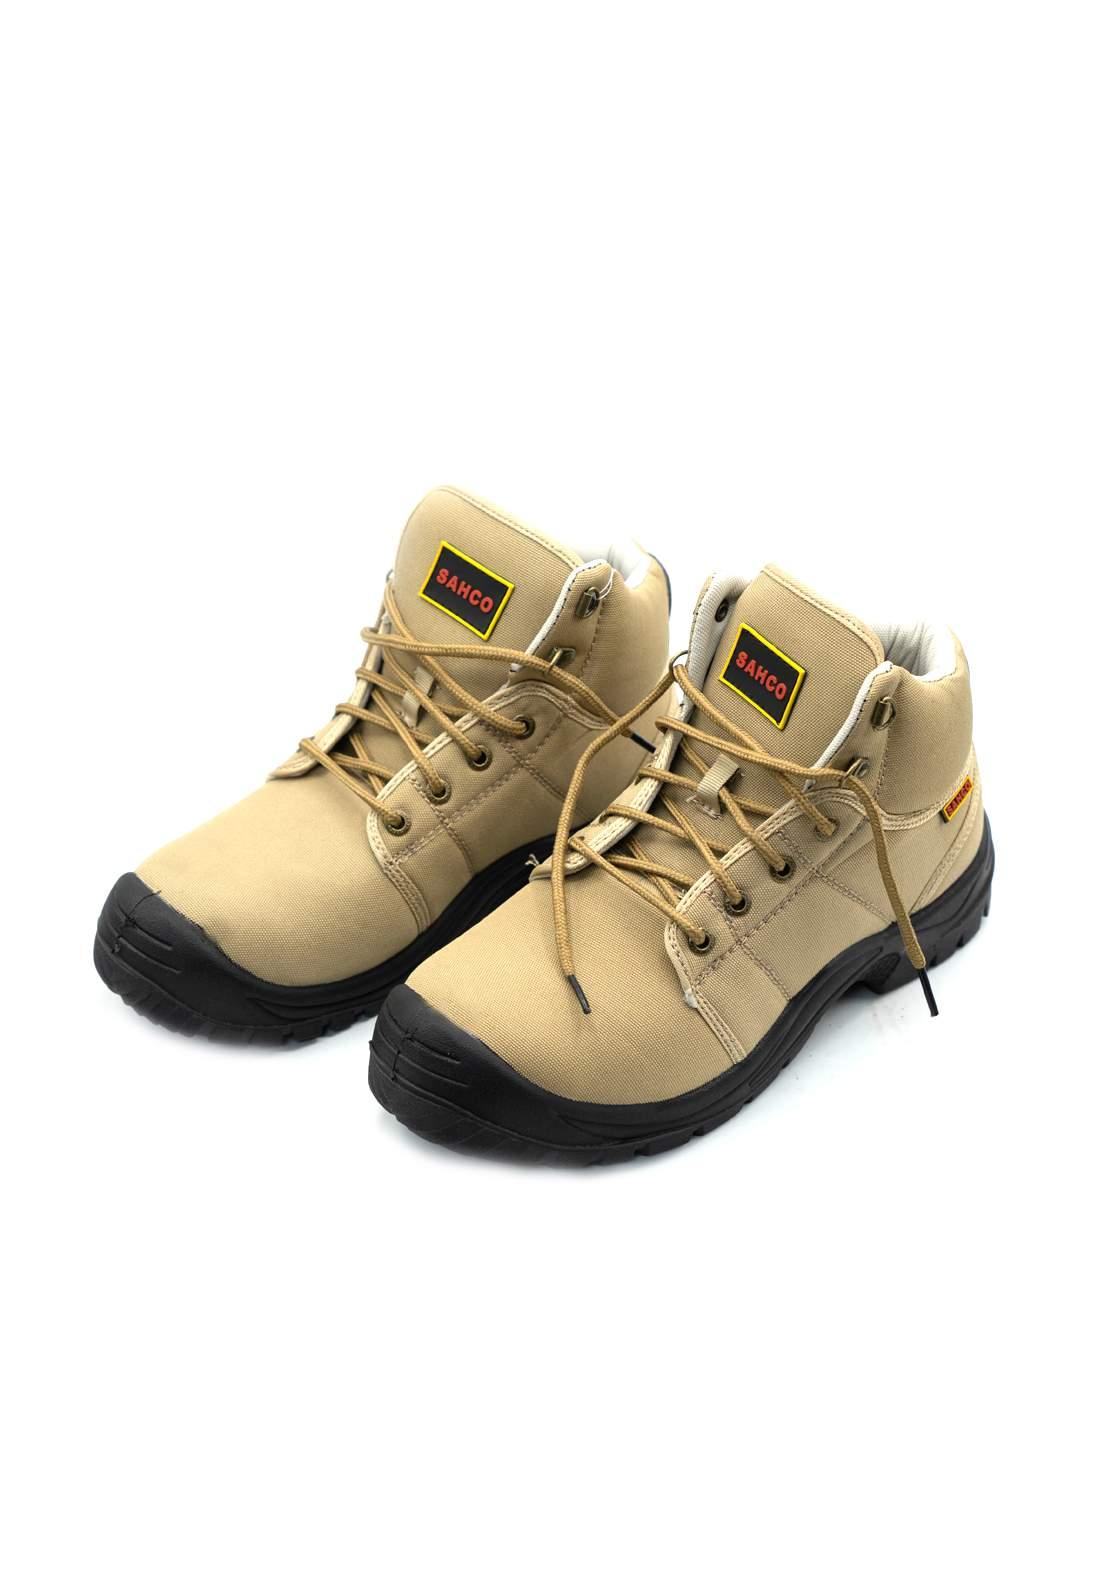 Subul Alhurra Safety Shoes Low Cut Beige حذاء السلامة للعمل